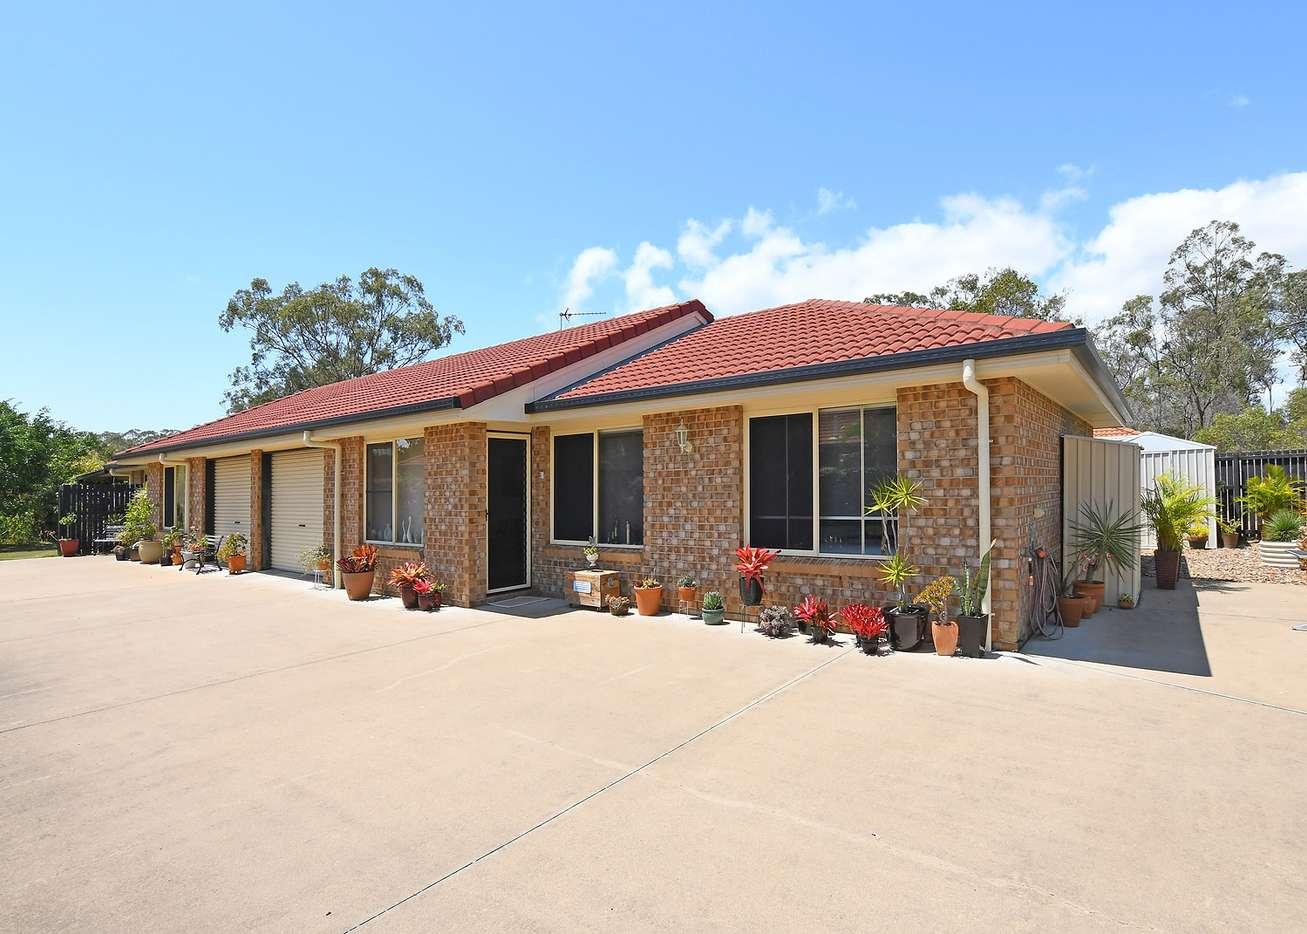 Main view of Homely semidetached listing, 1 112 BIDEFORD STREET, Torquay, QLD 4655